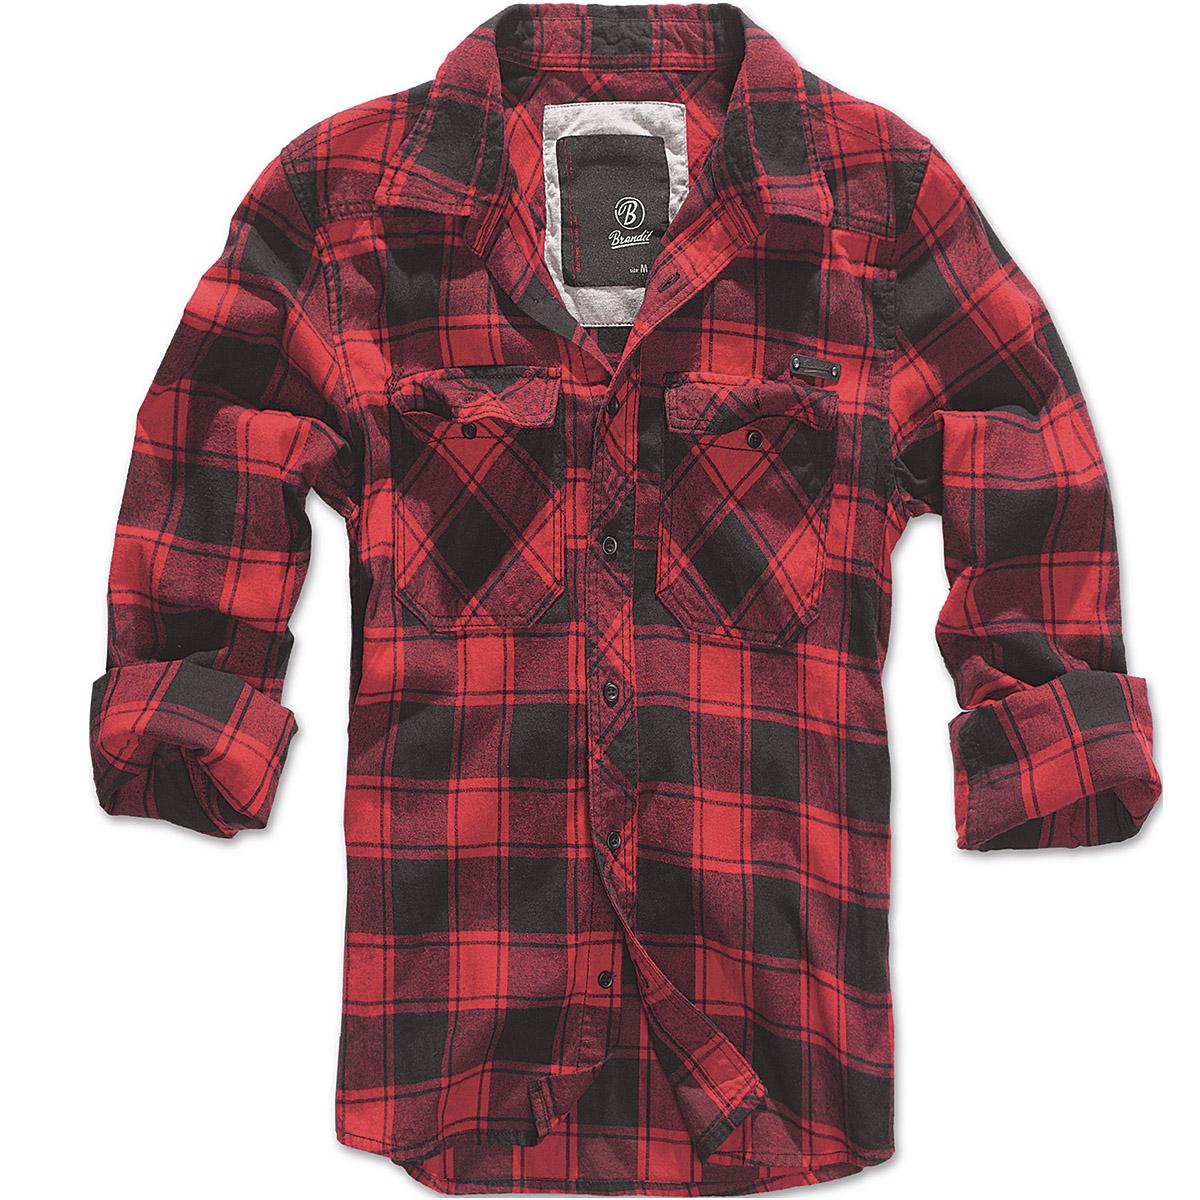 Brandit mens casual check cotton flannel shirt long sleeve for Best flannel shirt brands